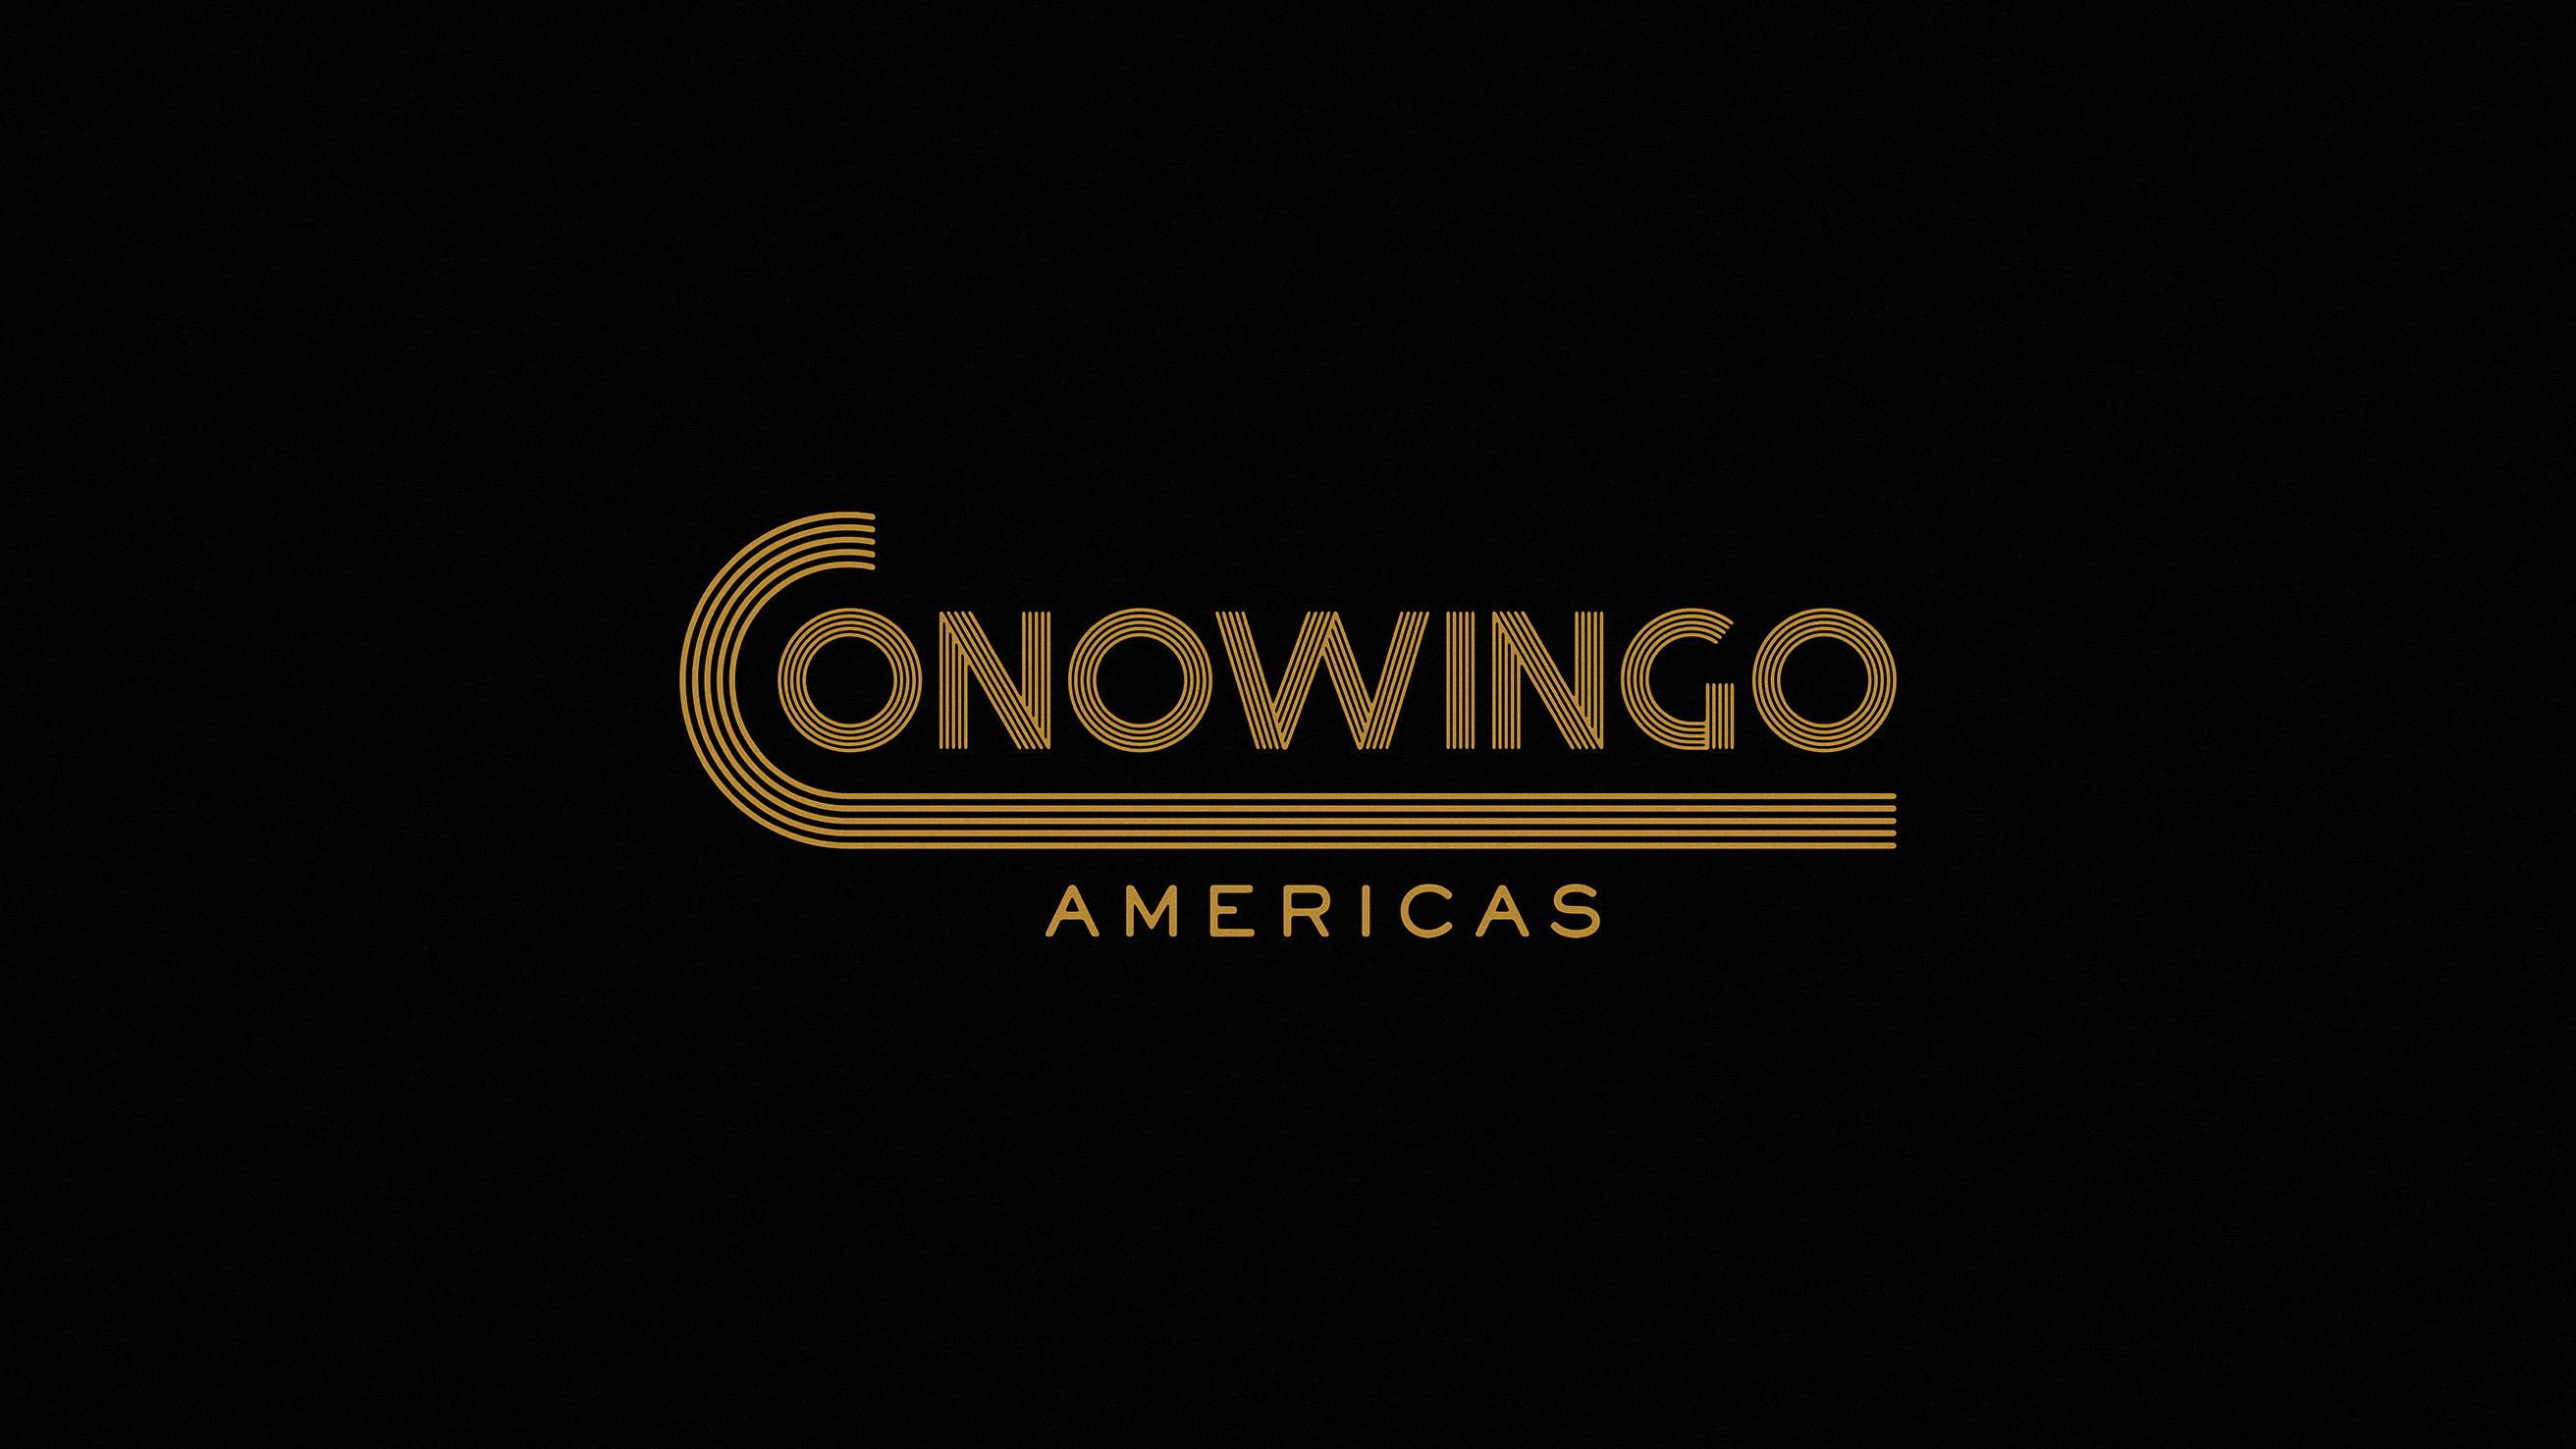 MGS_Conowingo_002